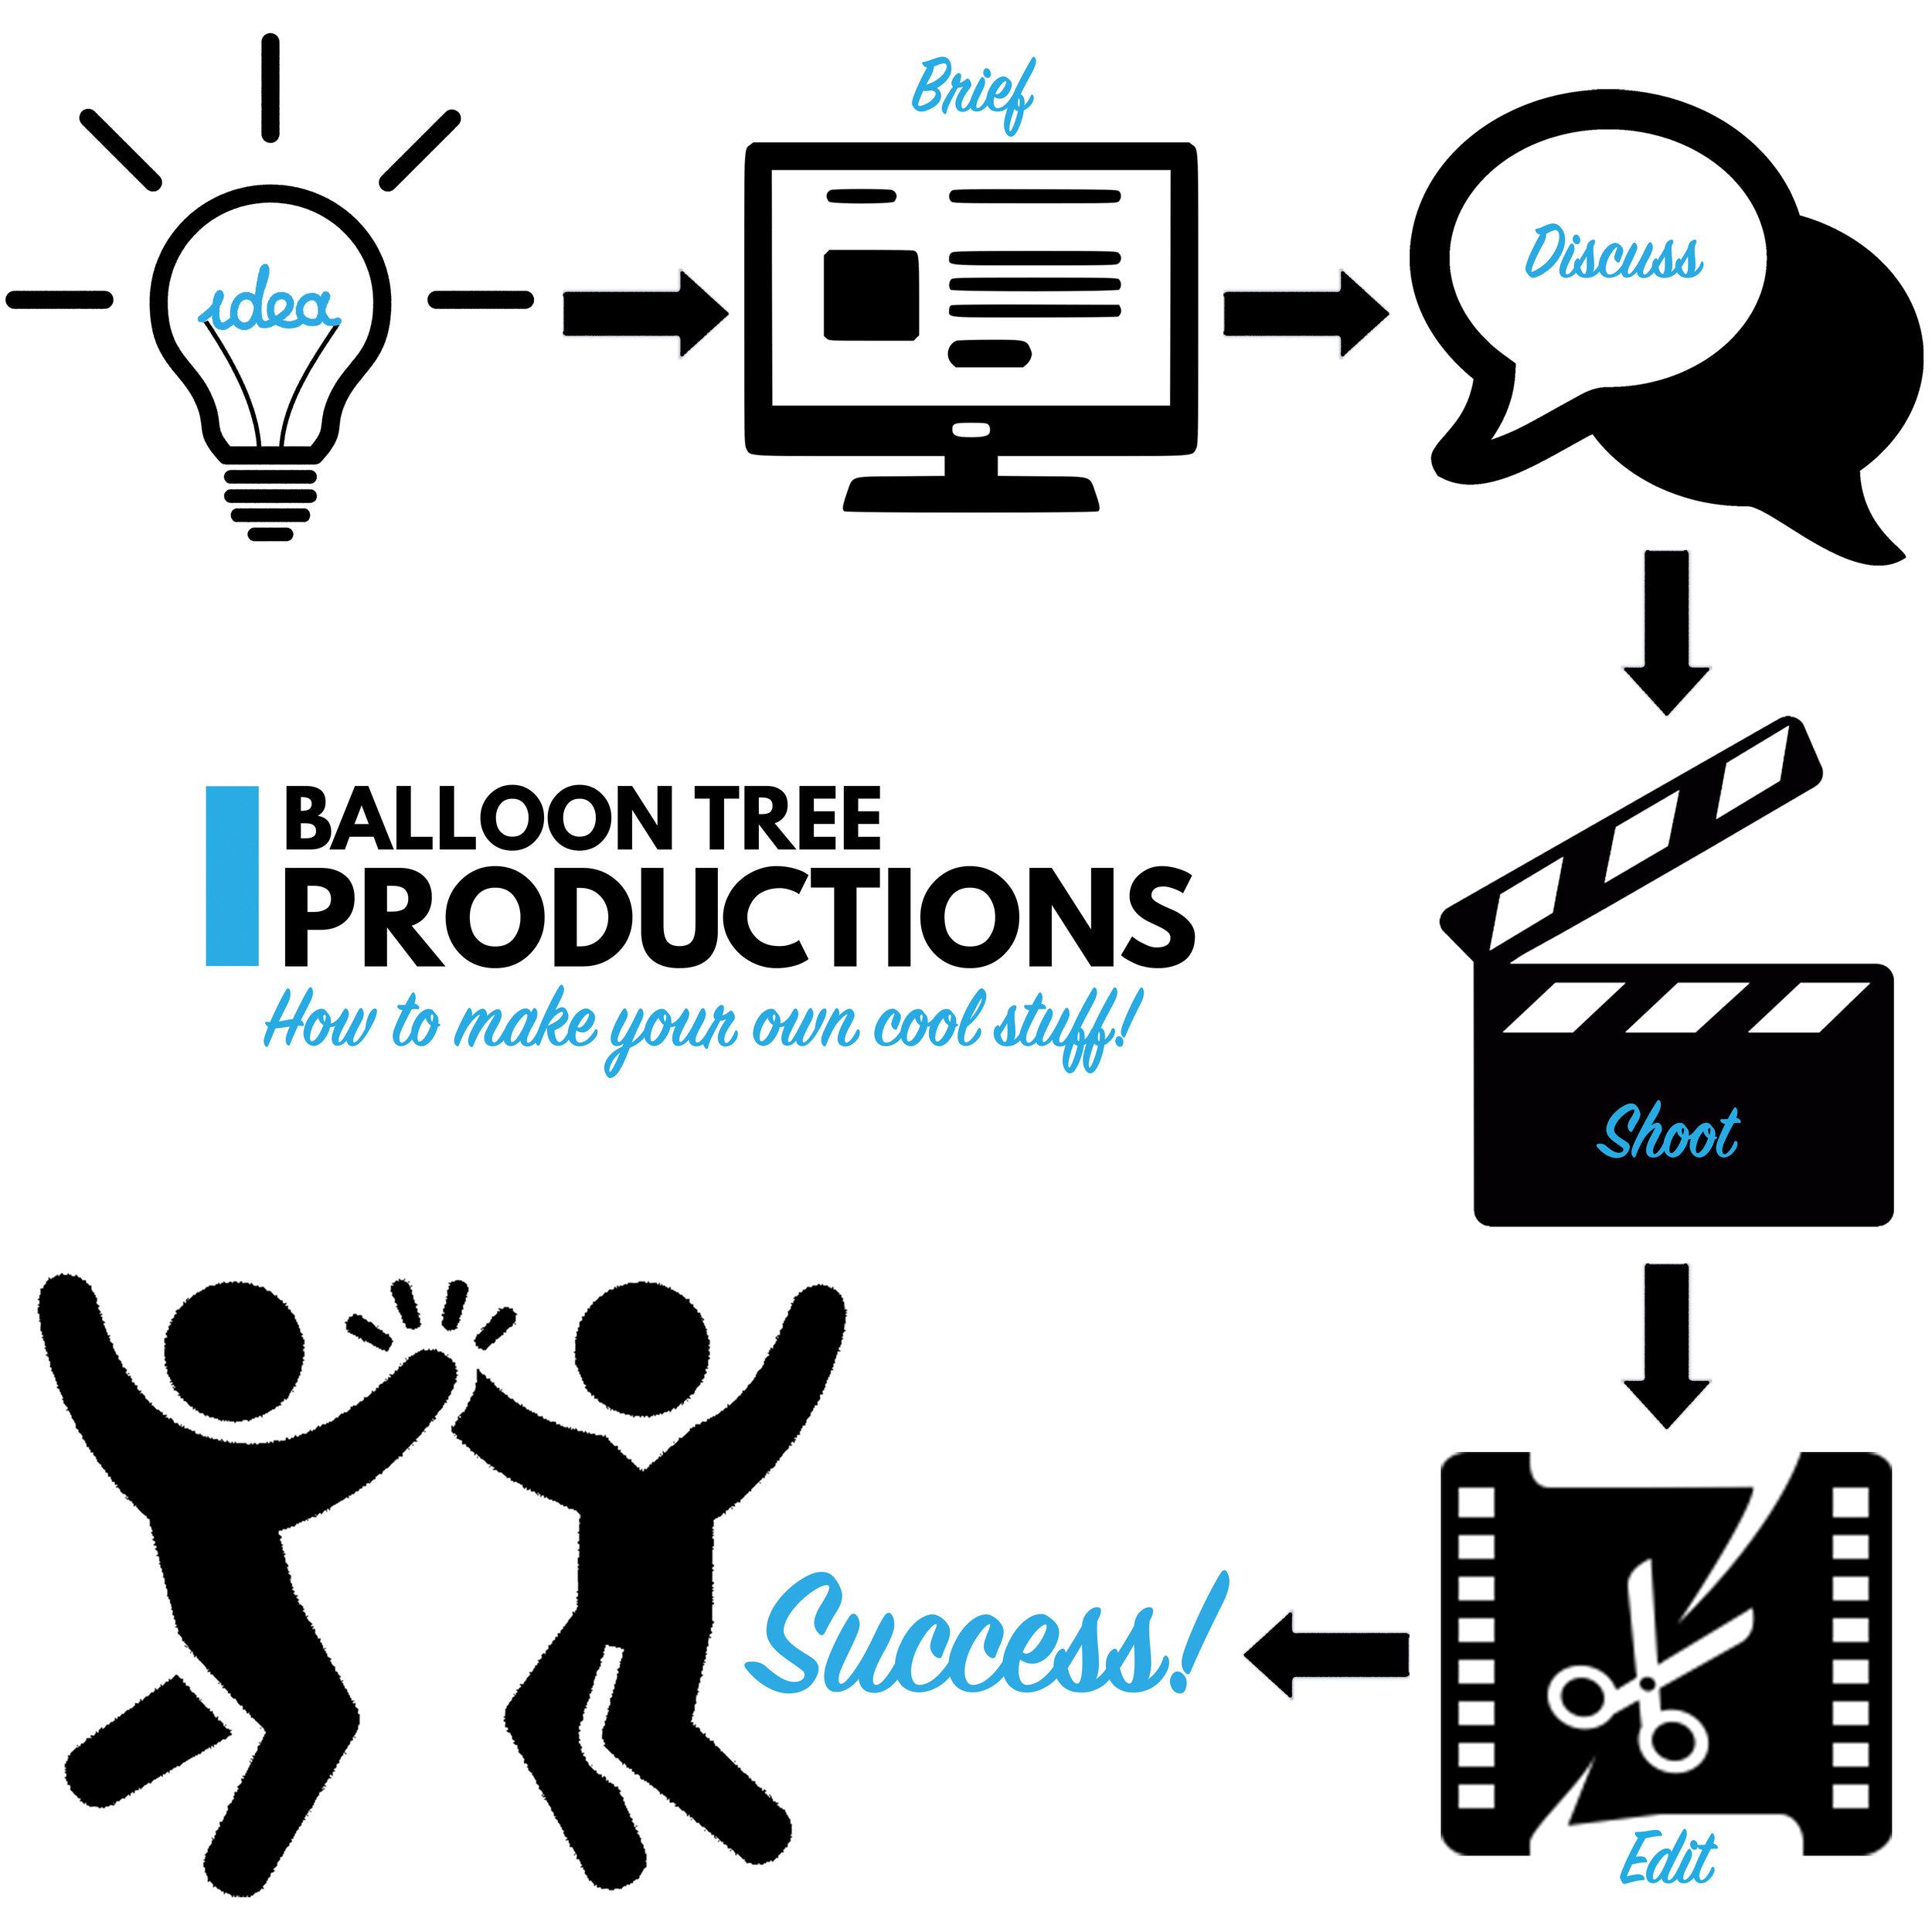 BTP Production Work Flow.jpg